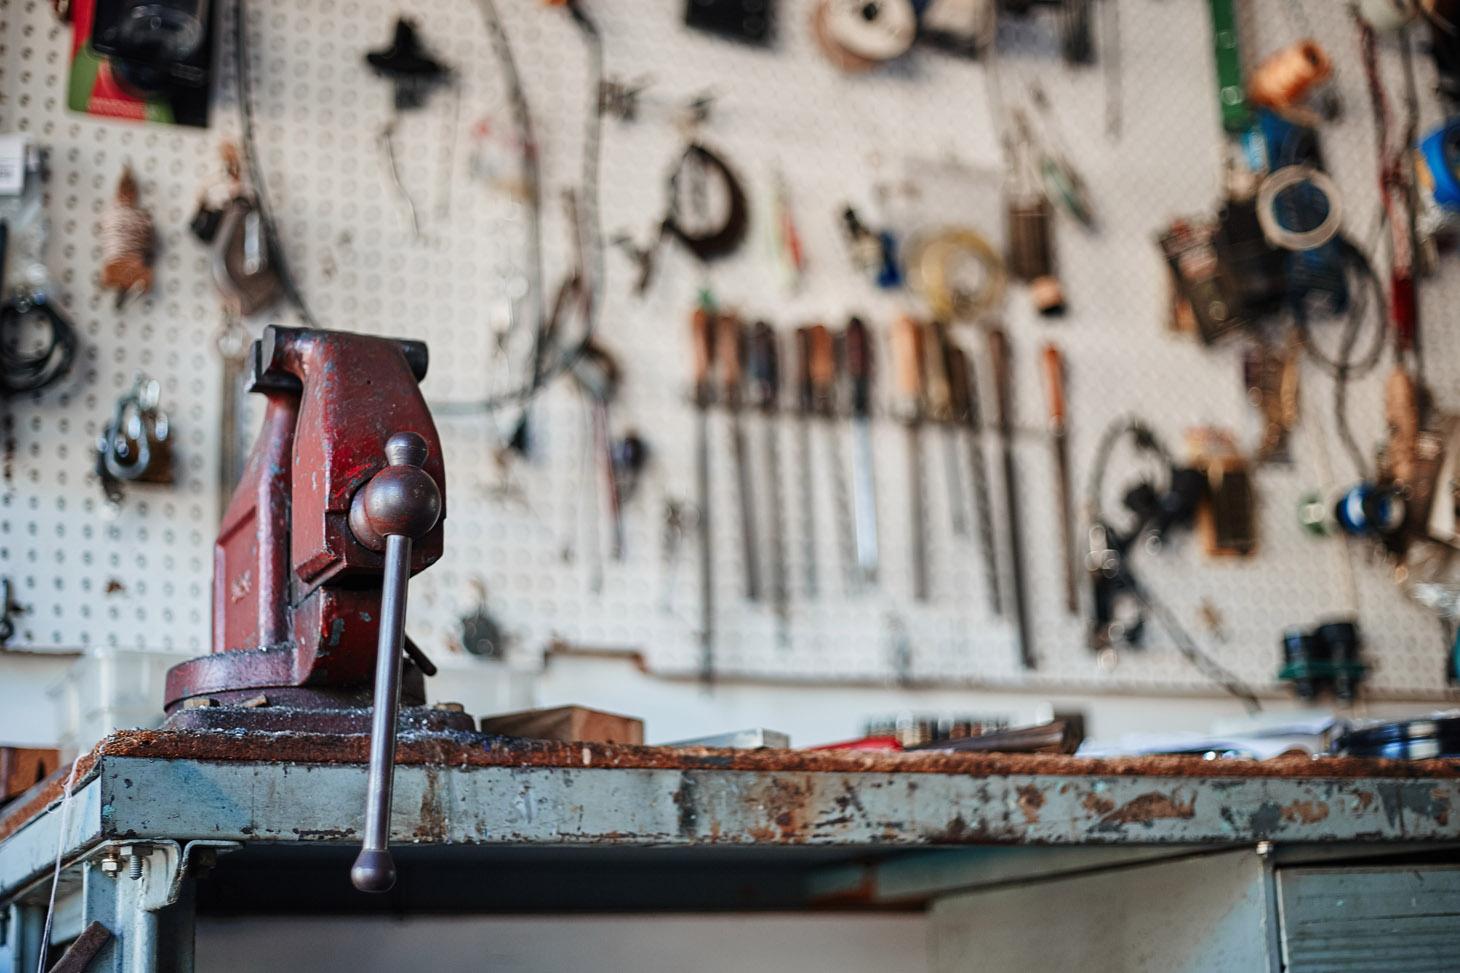 work-tools-garage